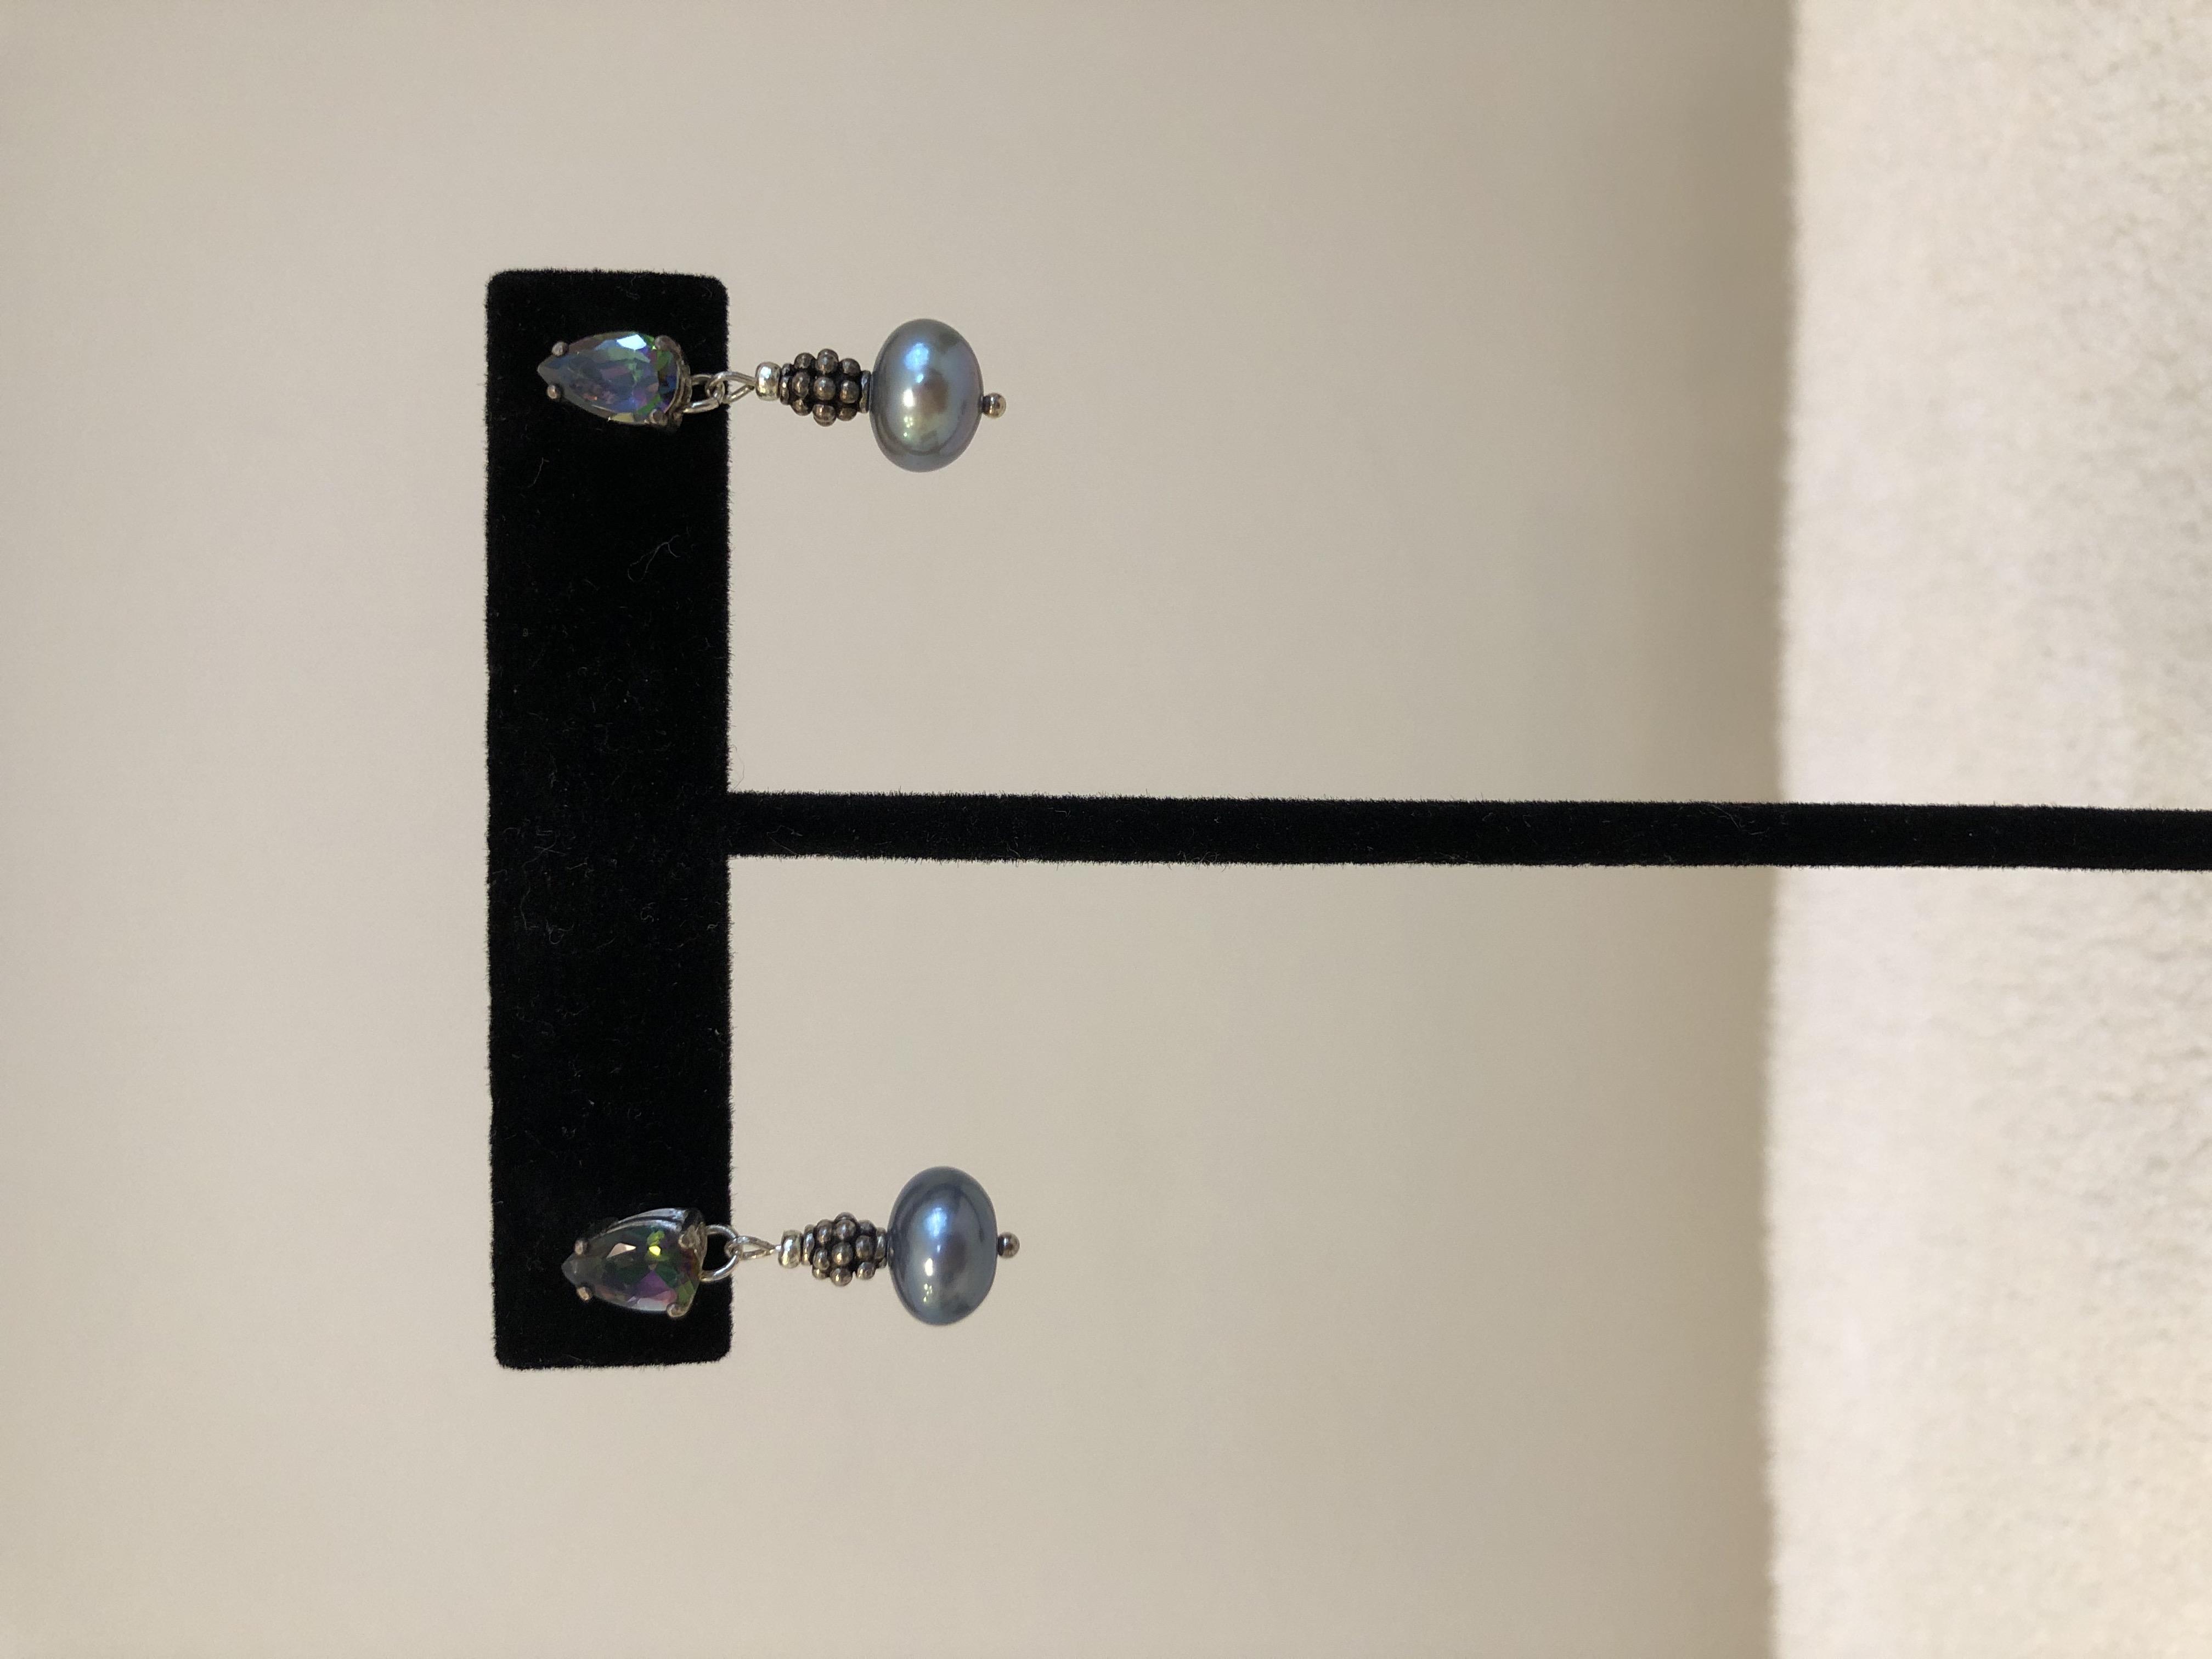 Sterling Silver Stud Earrings, w/Freshwater 8.5mm Charcoal Pearls & Mystic Topaz